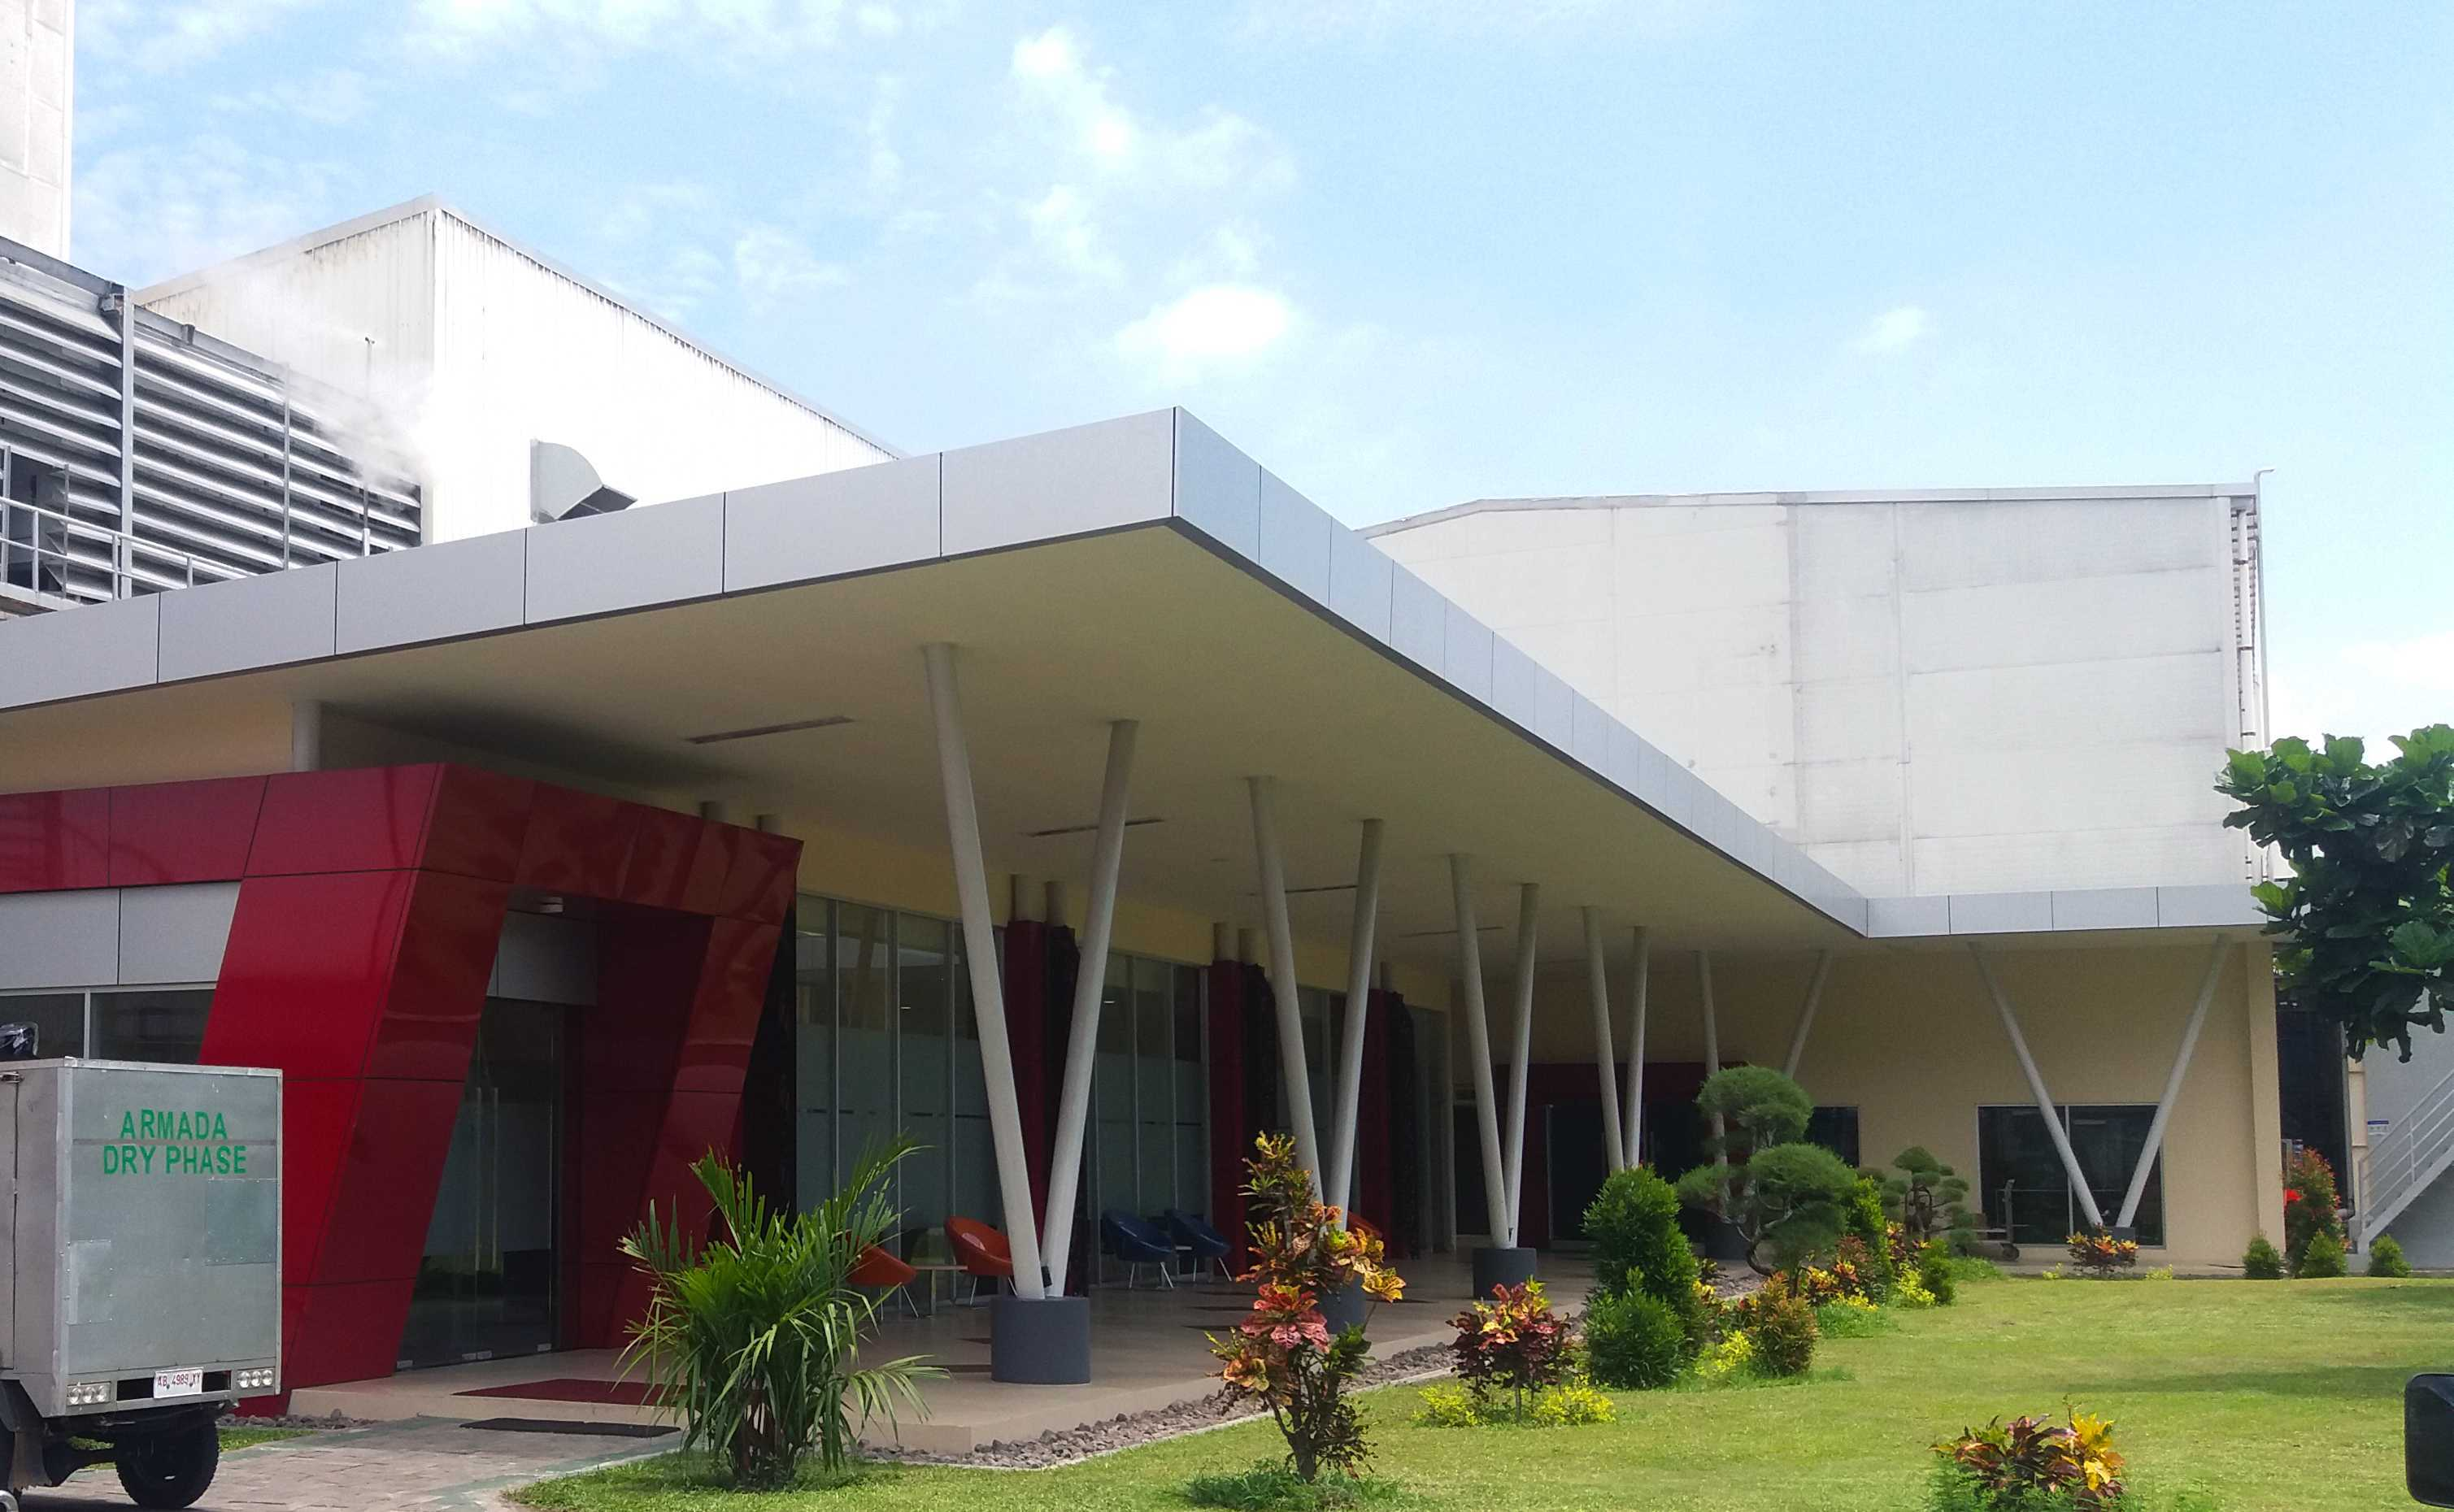 Limasaka Studio Pt. Sari Husada 2  Office Klaten, Klaten Regency, Central Java, Indonesia Klaten, Klaten Regency, Central Java, Indonesia Limasaka-Studio-Pt-Sari-Husada-2-Office   62424